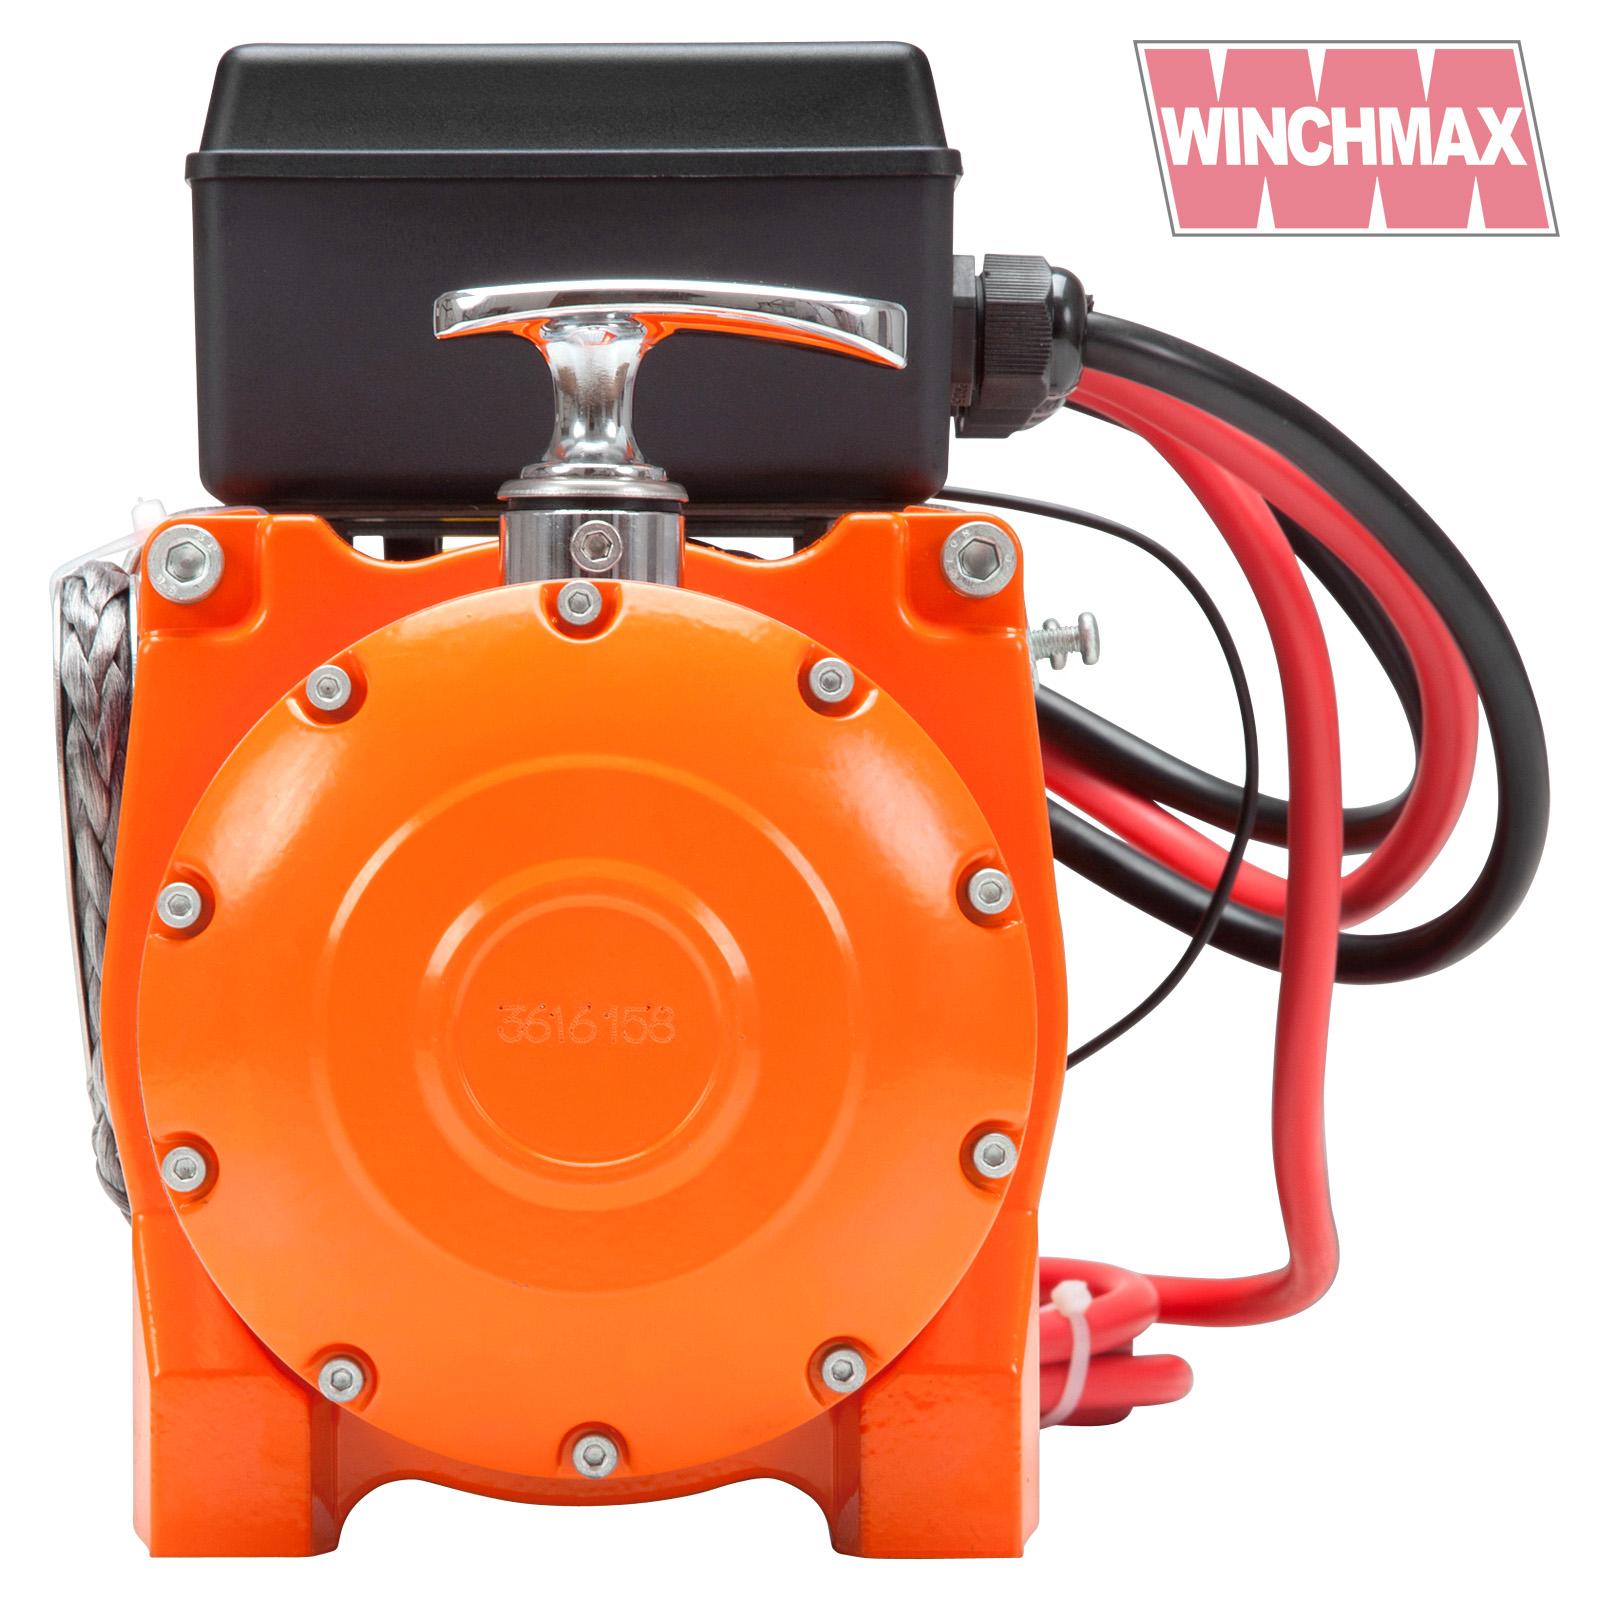 Wm1350012vsyn winchmax 509